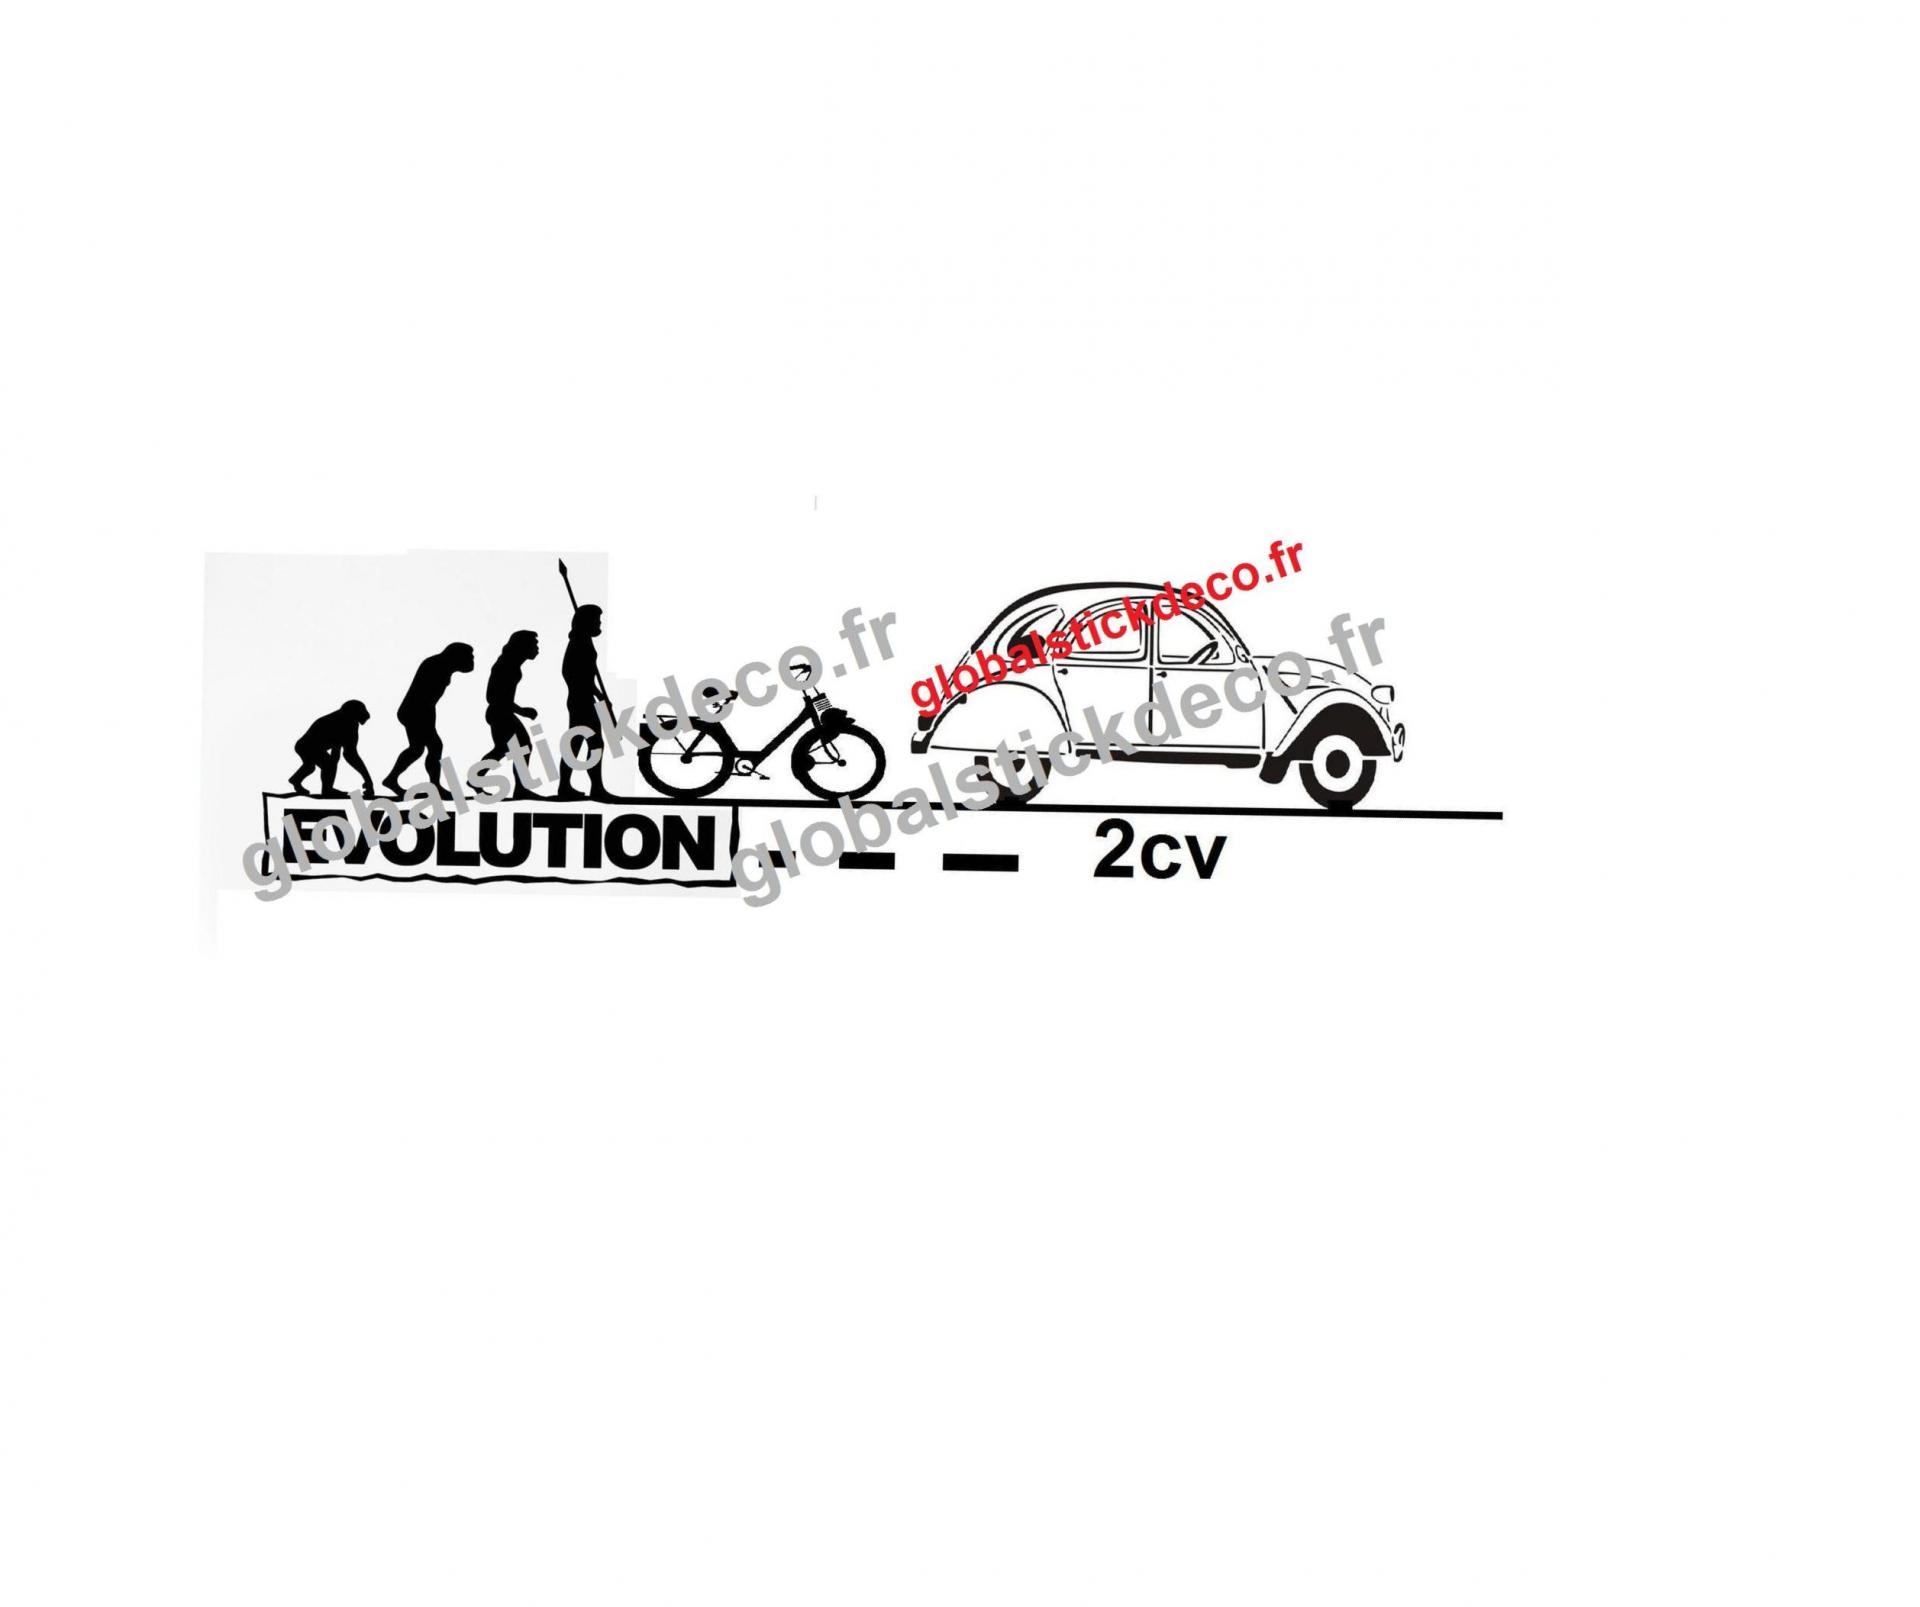 Evolution 2cv